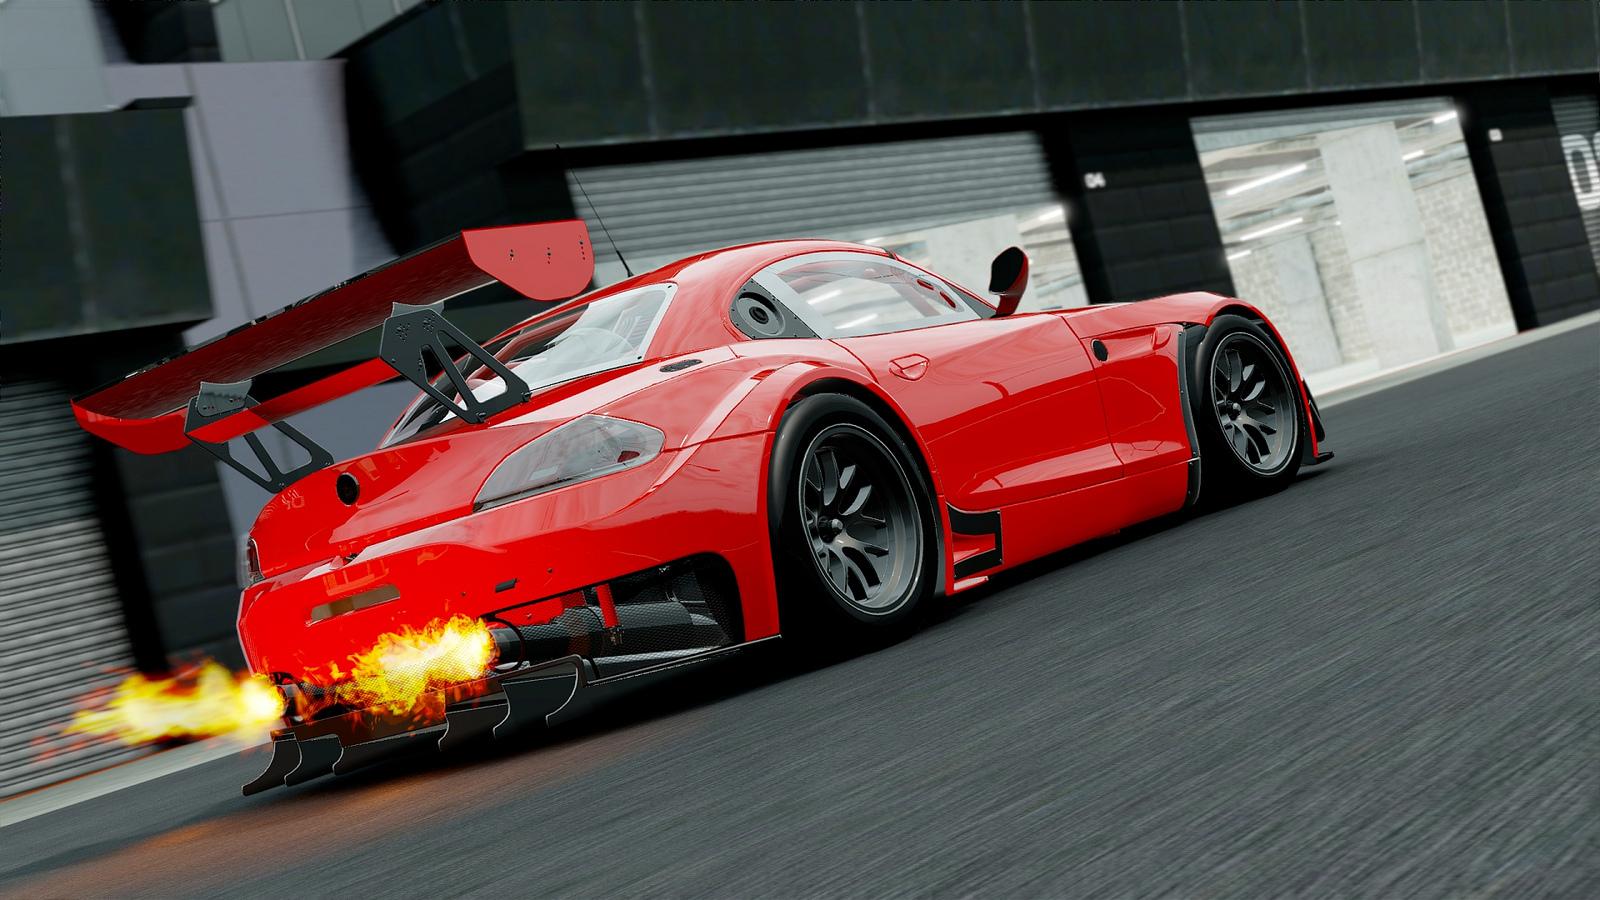 Project Cars Build 301 Available Virtualr Net Sim